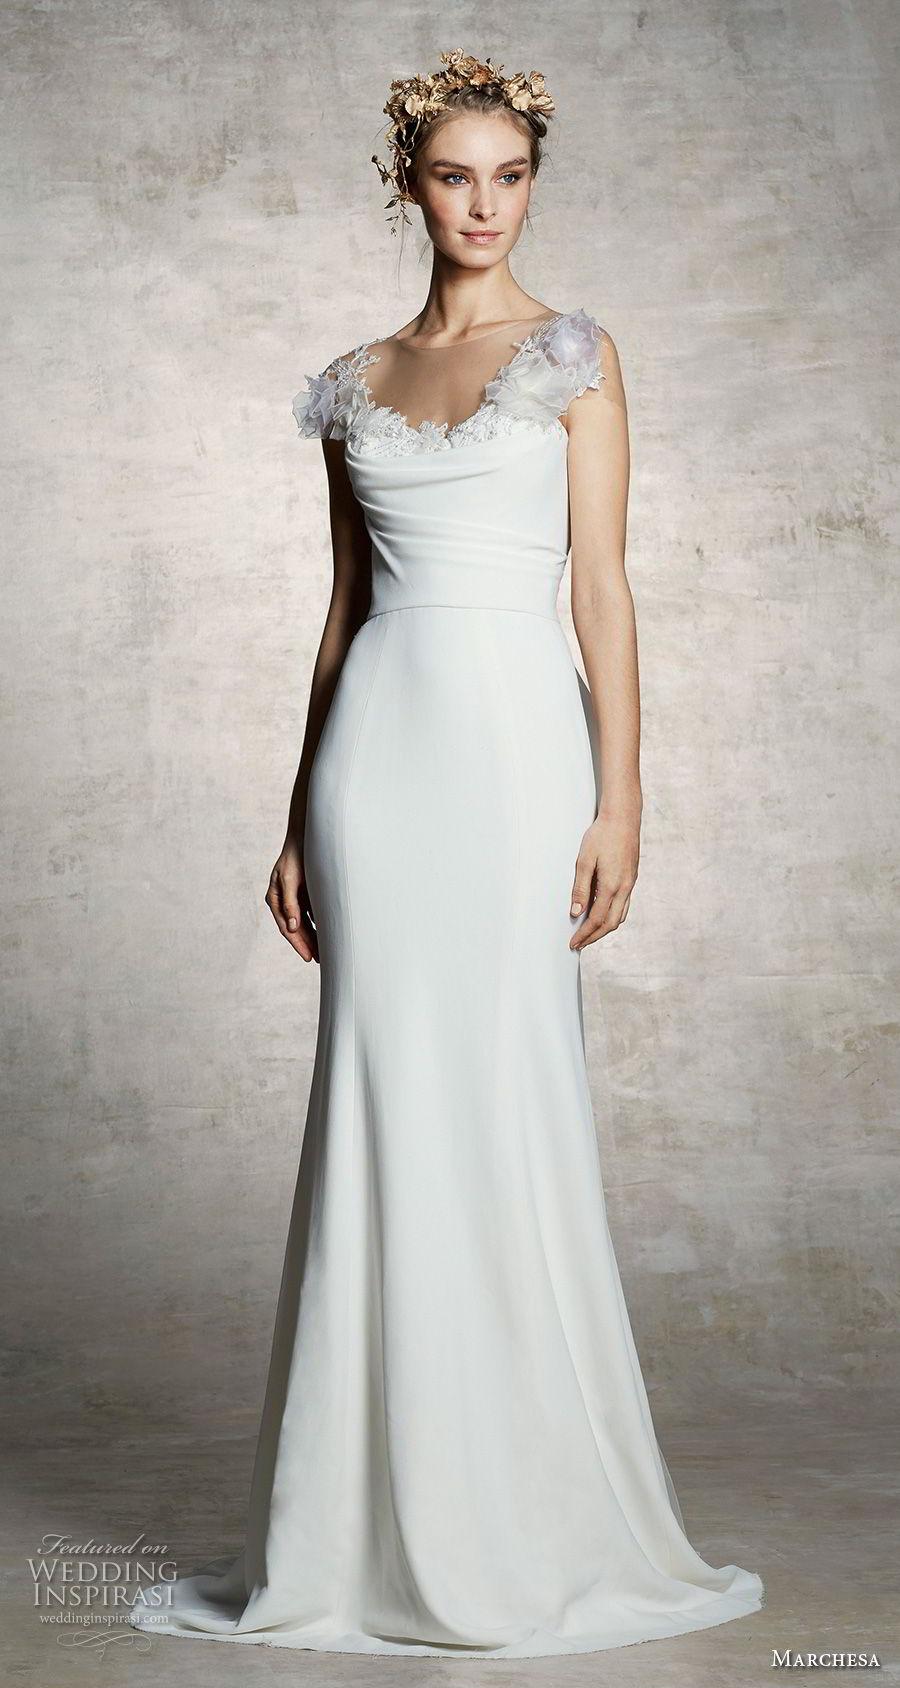 Marchesa Spring 2019 Wedding Dresses Wedding Inspirasi